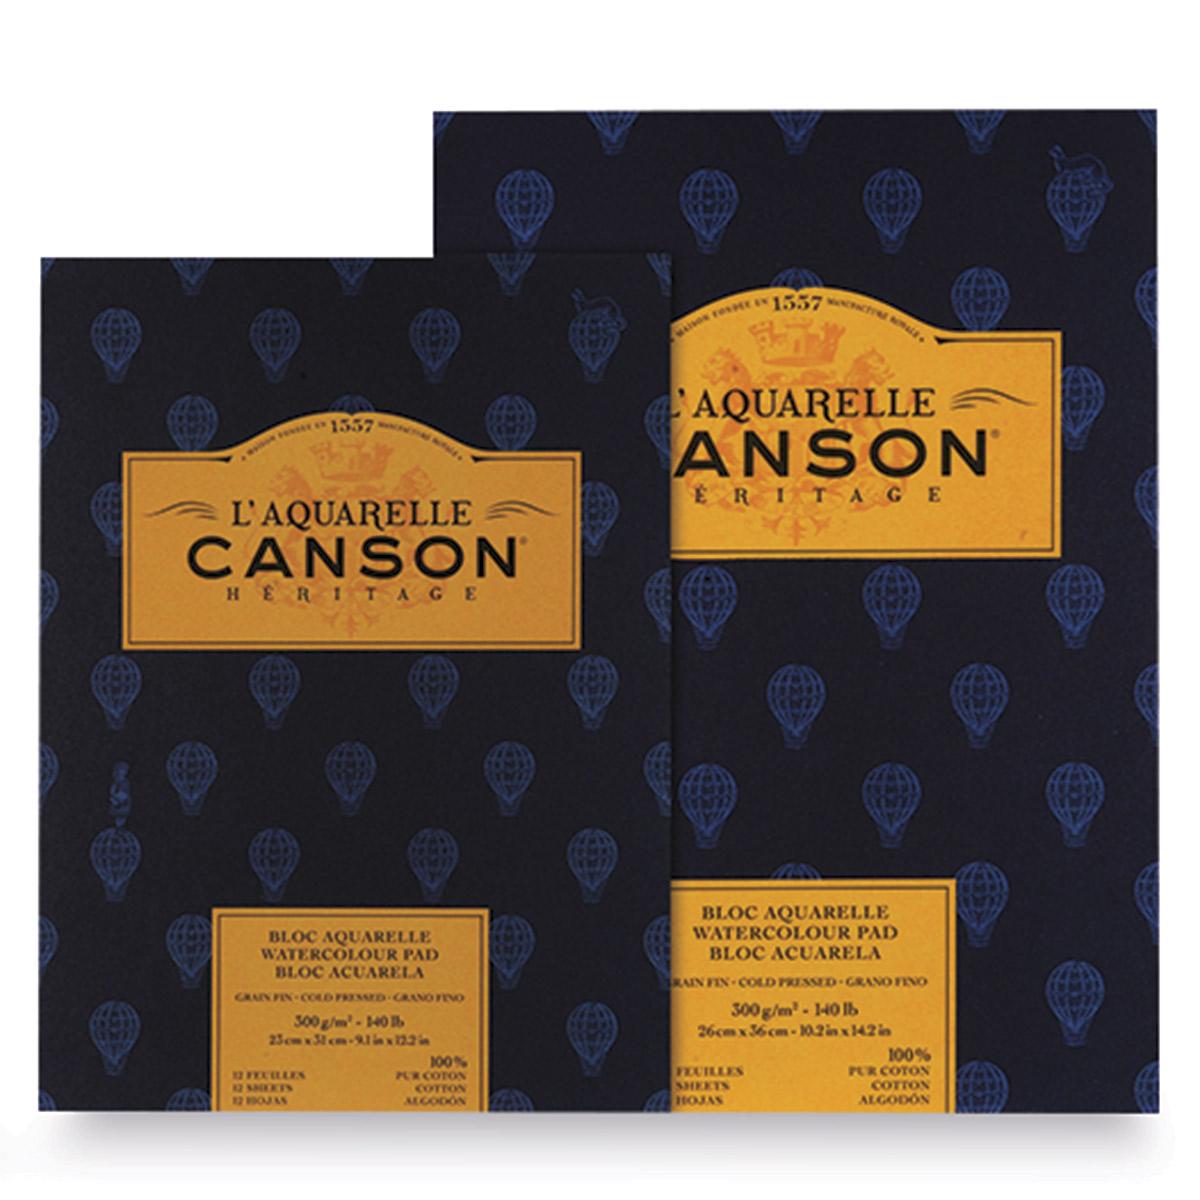 Canson L/'Aquarelle Heritage pads watercolour paper 300gsm 140lb Hot cold press